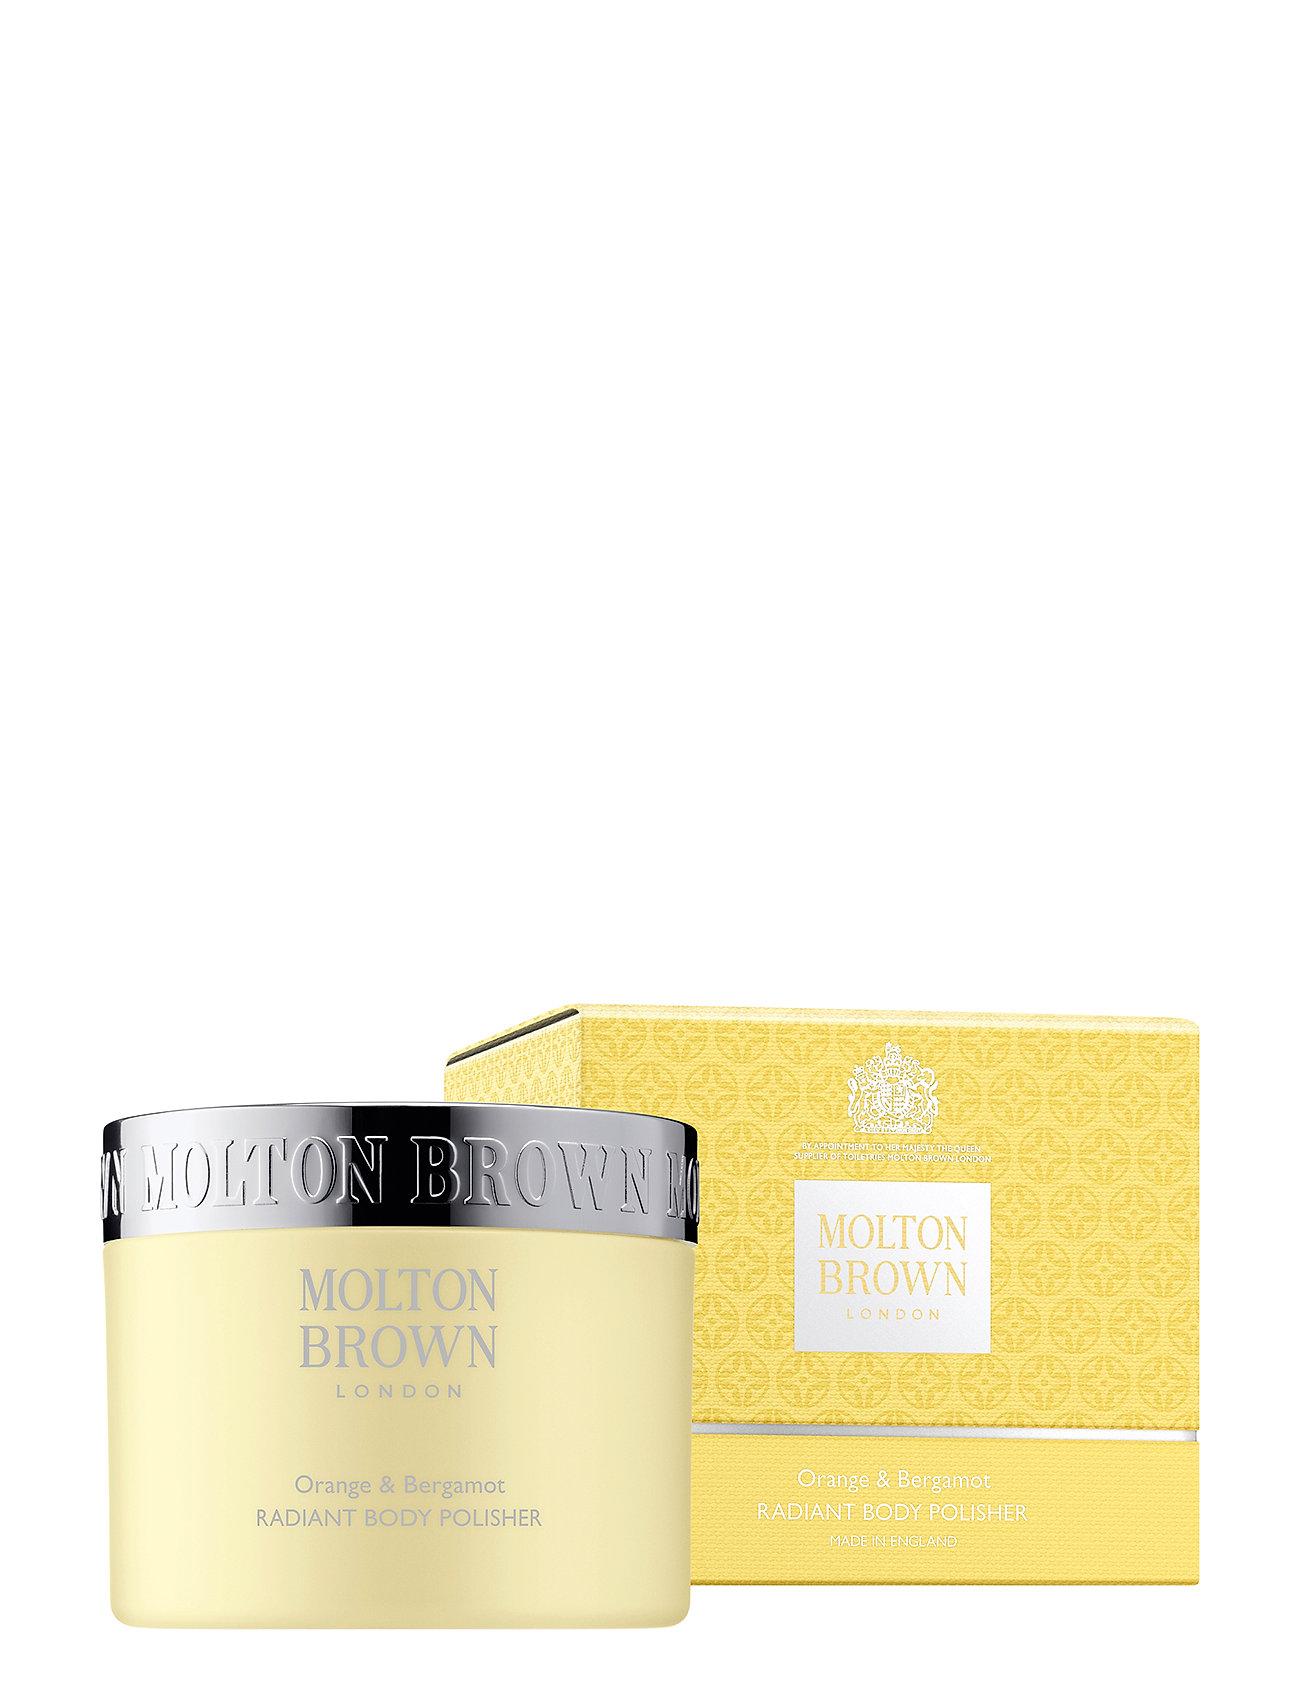 Molton Brown Orange & Bergamot Radiant Body Polisher - NO COLOUR